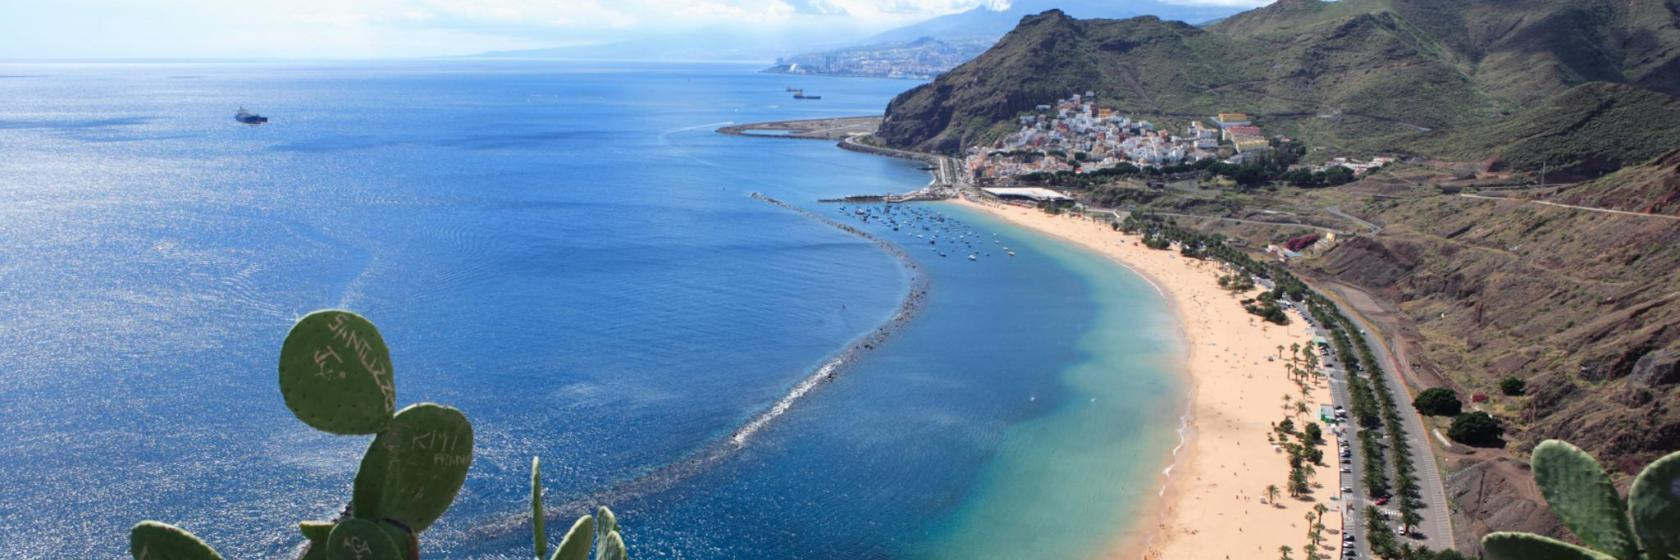 Tenerife: i 10 migliori hotel. Tenerife, (Spagna): dove ...